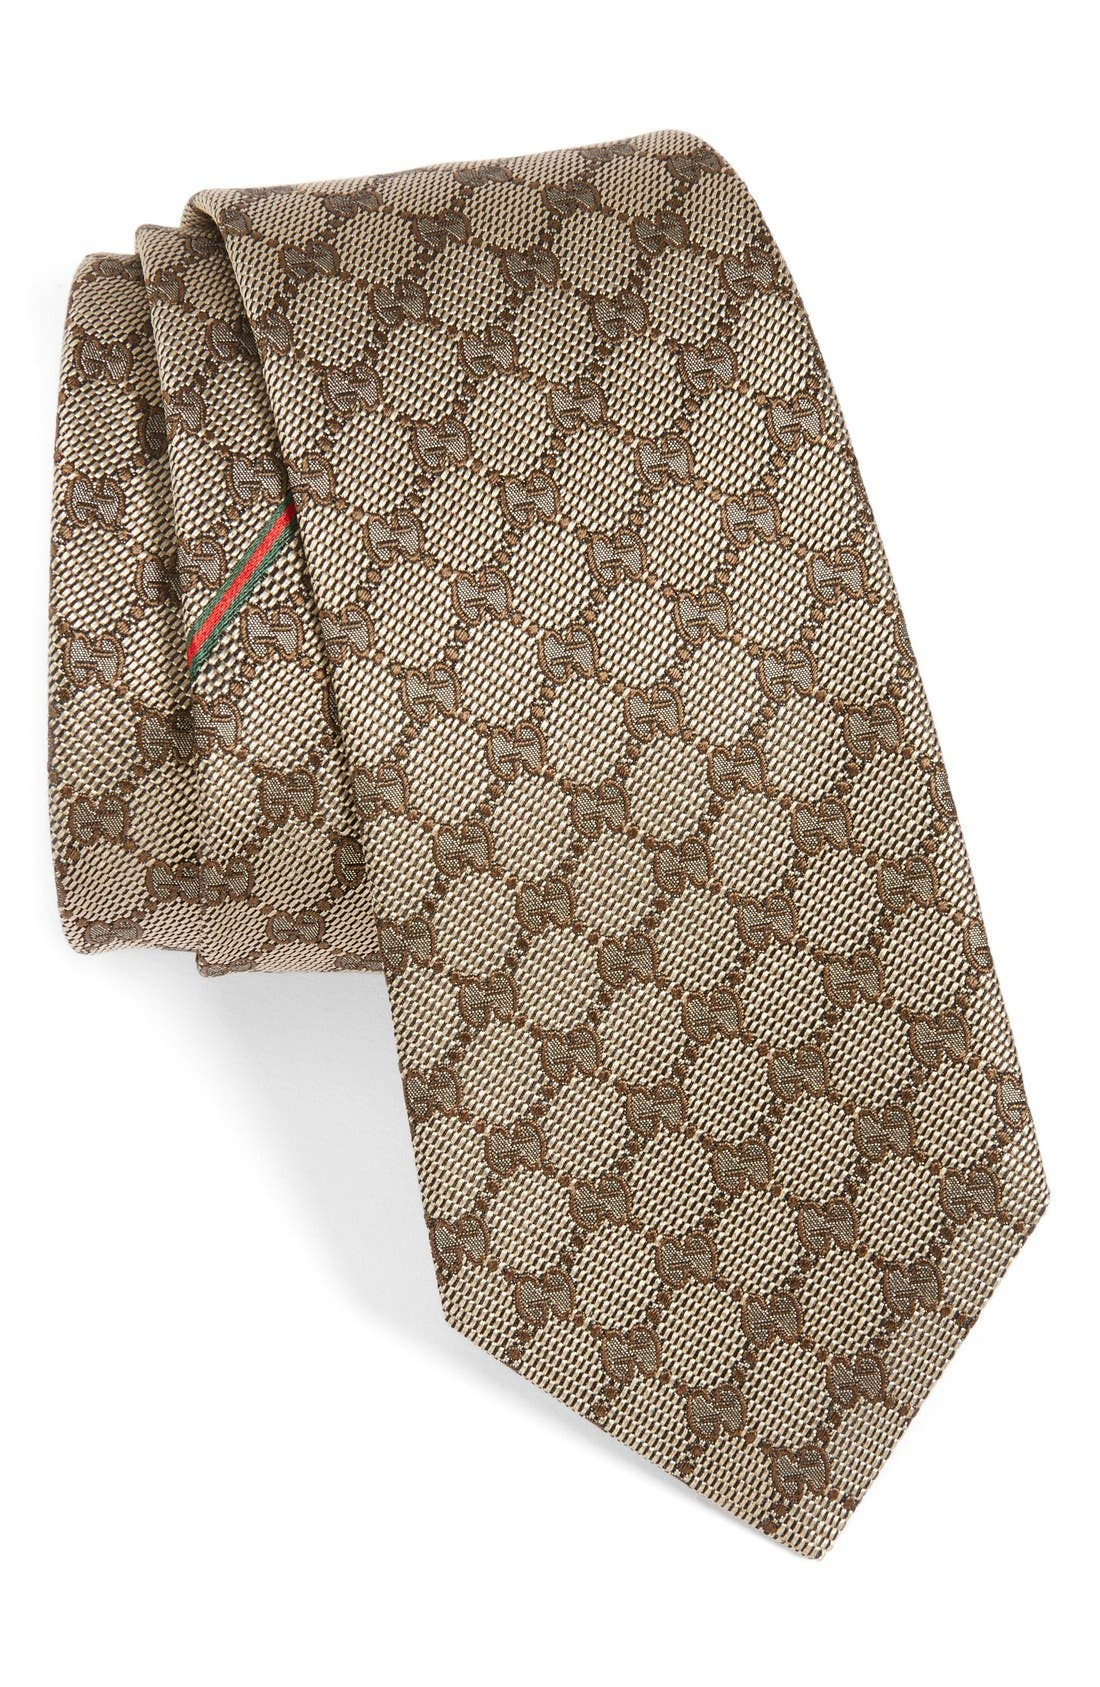 GUCCI Arend Silk Jacquard Tie